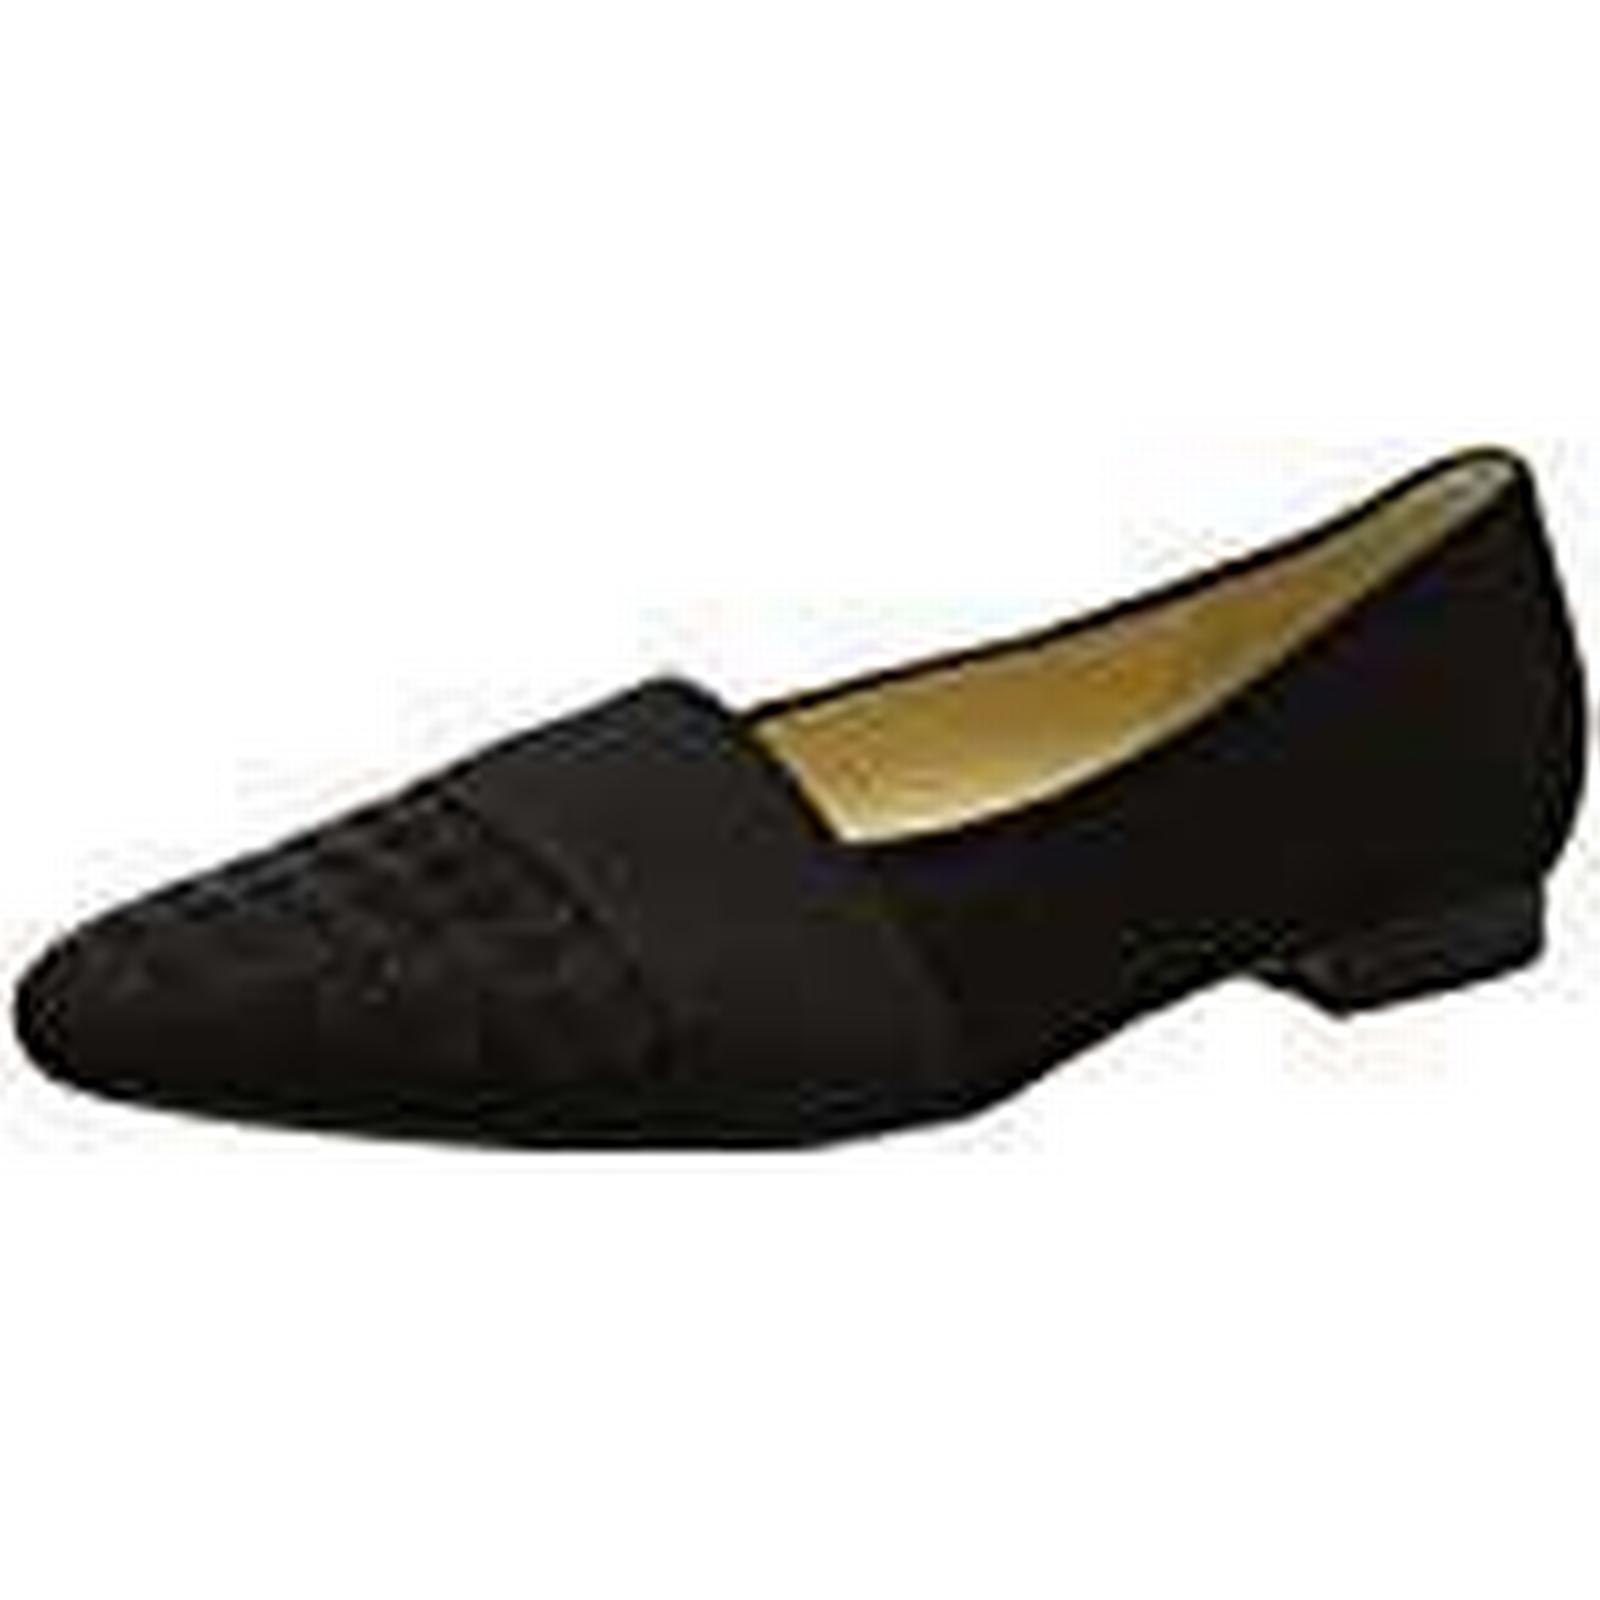 Gabor Shoes Women's 4 Basic Closed-Toe Pumps, (Black), 4 Women's UK 4 UK a3f062